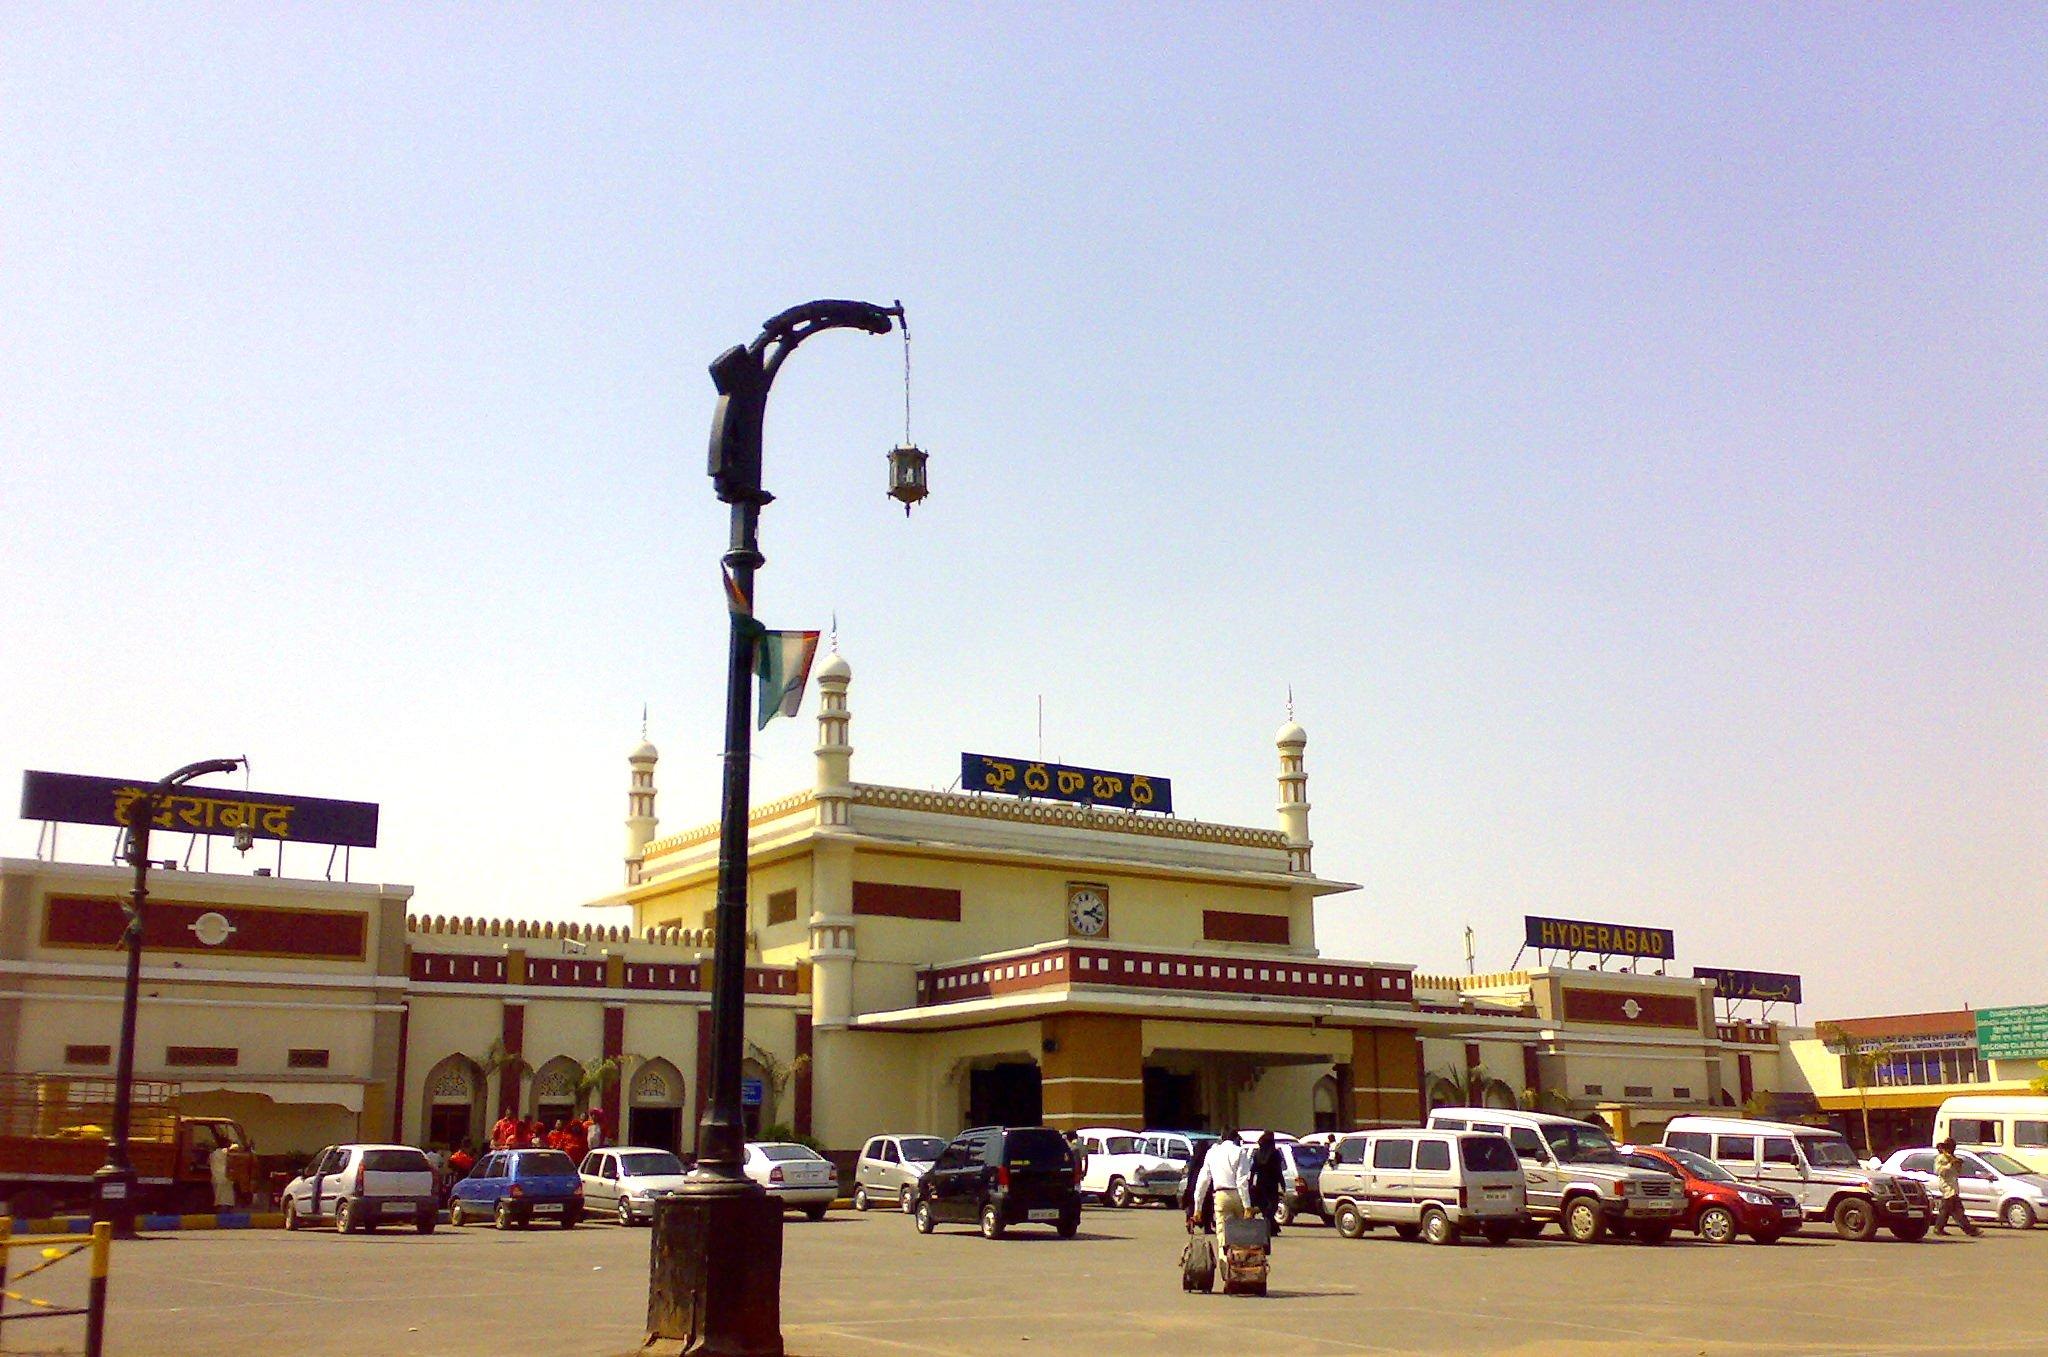 Hyderabad Decan Railway Station